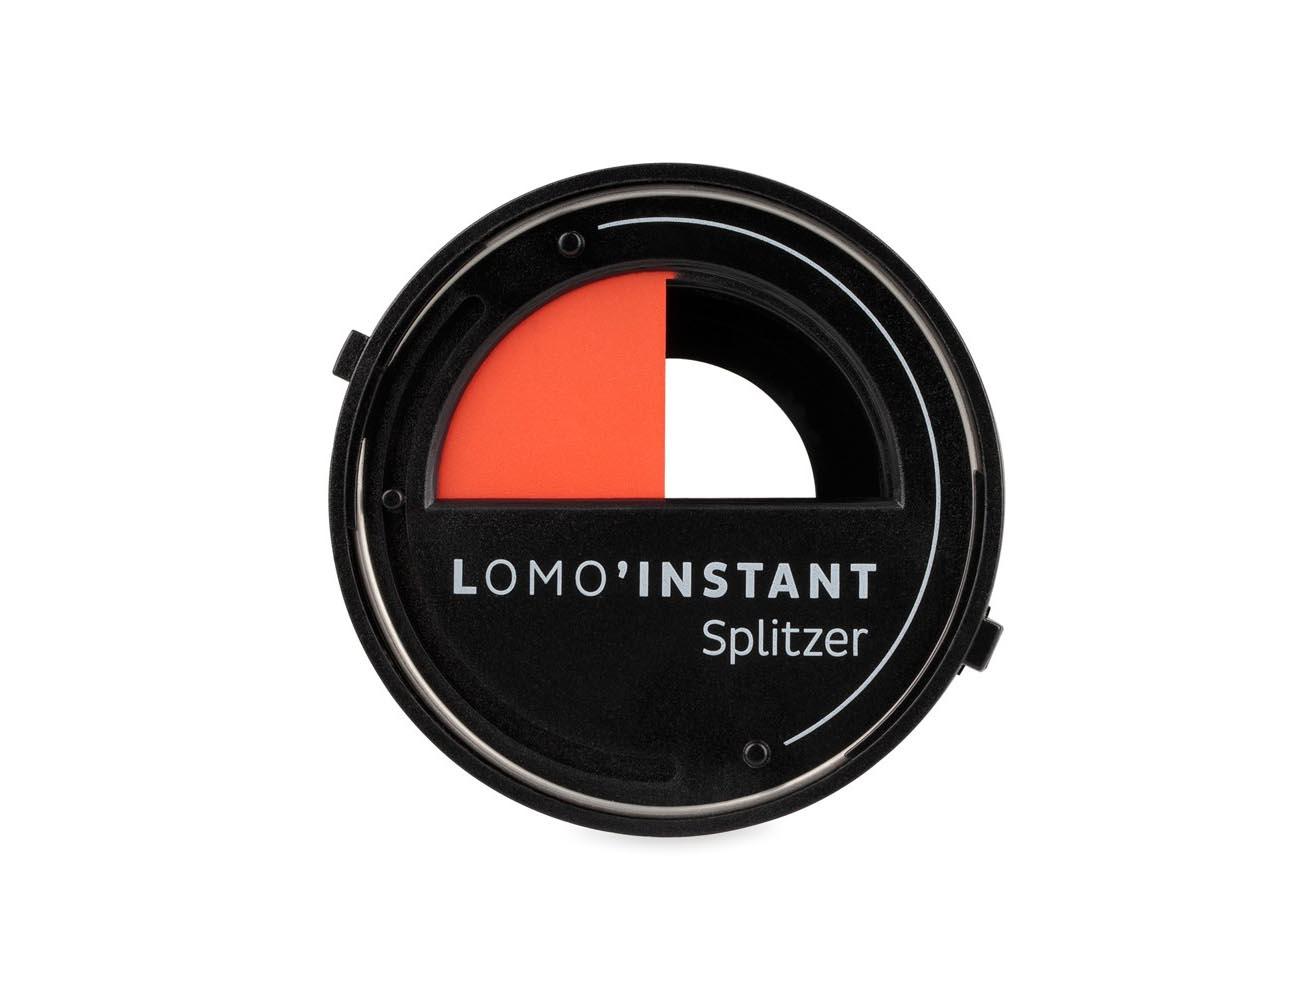 Lomo'Instant Splitzer – New Way of Shooting Instant Photos